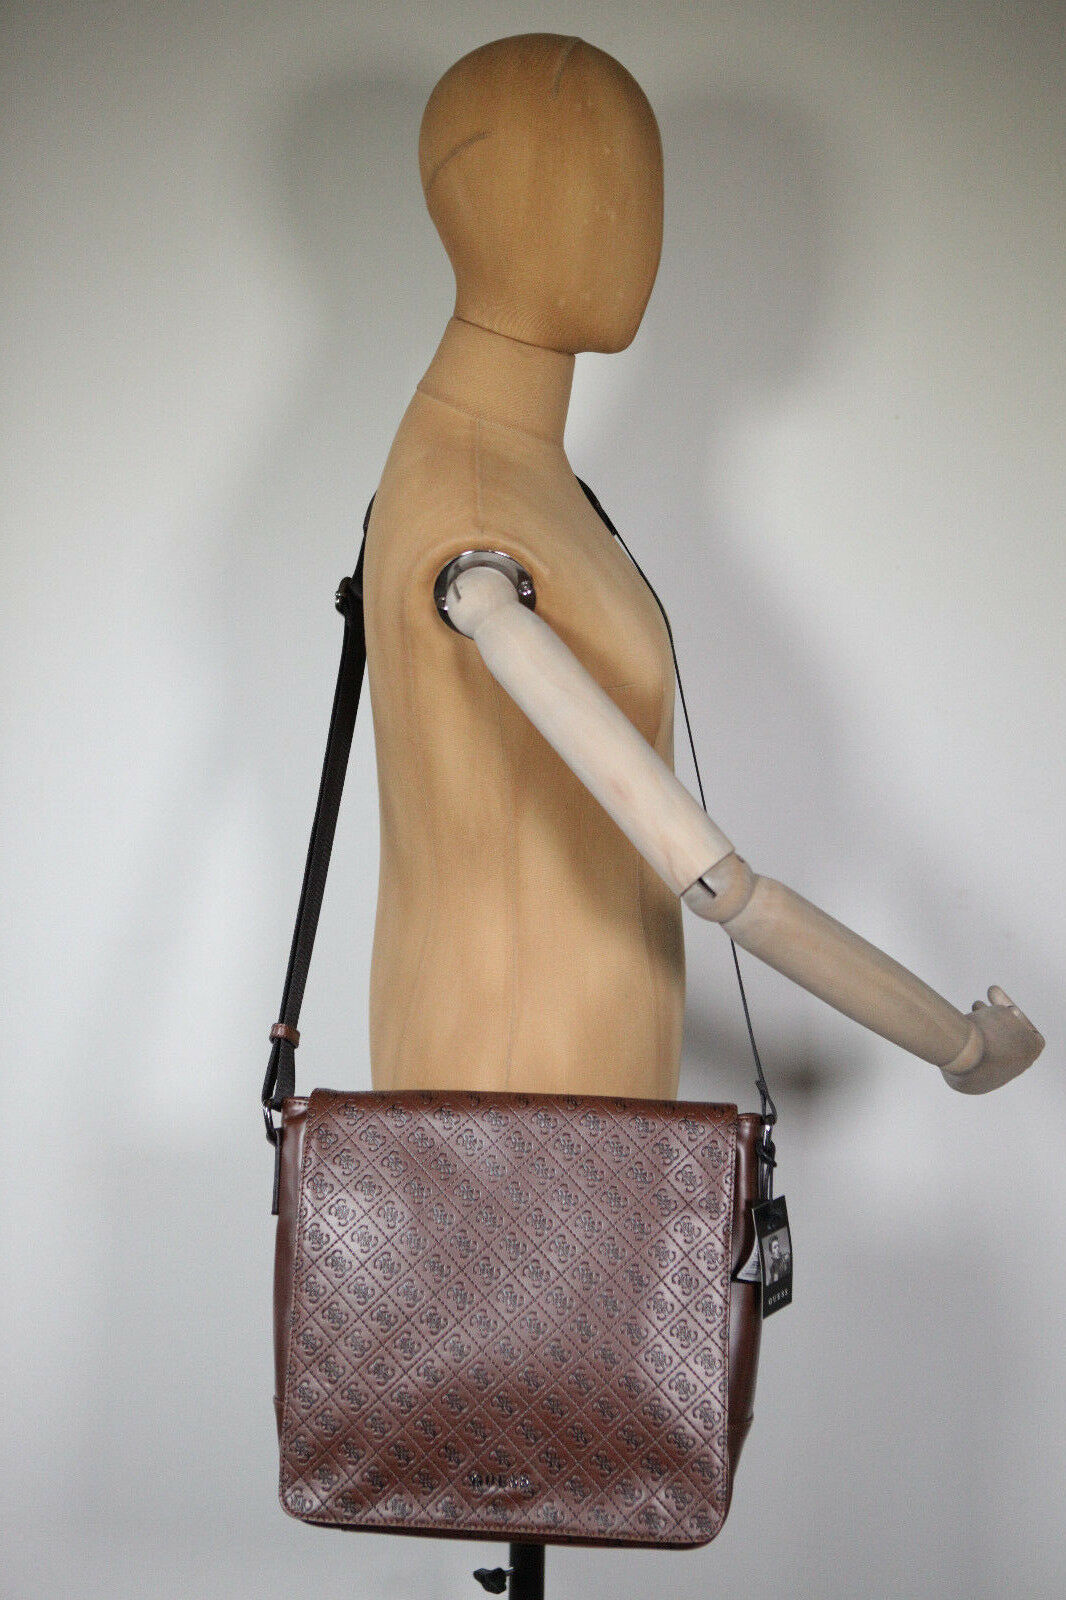 Neu Guess Herren Tasche Tasche Tasche Umhängetasche Messenger Office Bag Boston Logo 19 (105) | Preisreduktion  4898ca